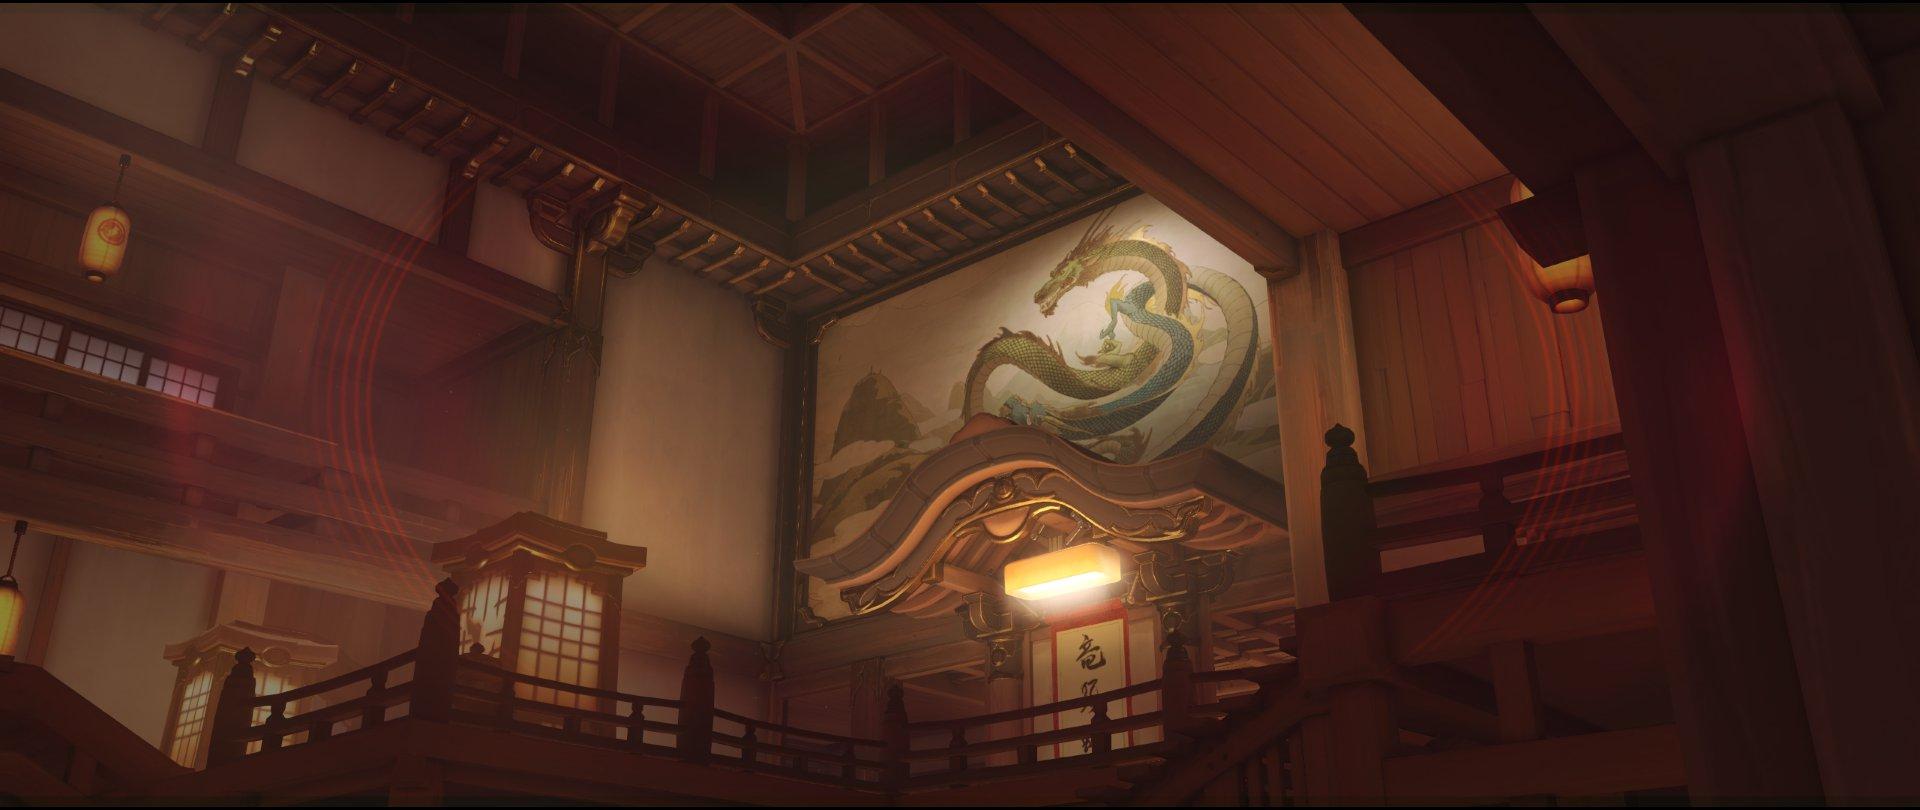 short to Roof counter attack Widowmaker sniping spot Hanamura Overwatch.jpg